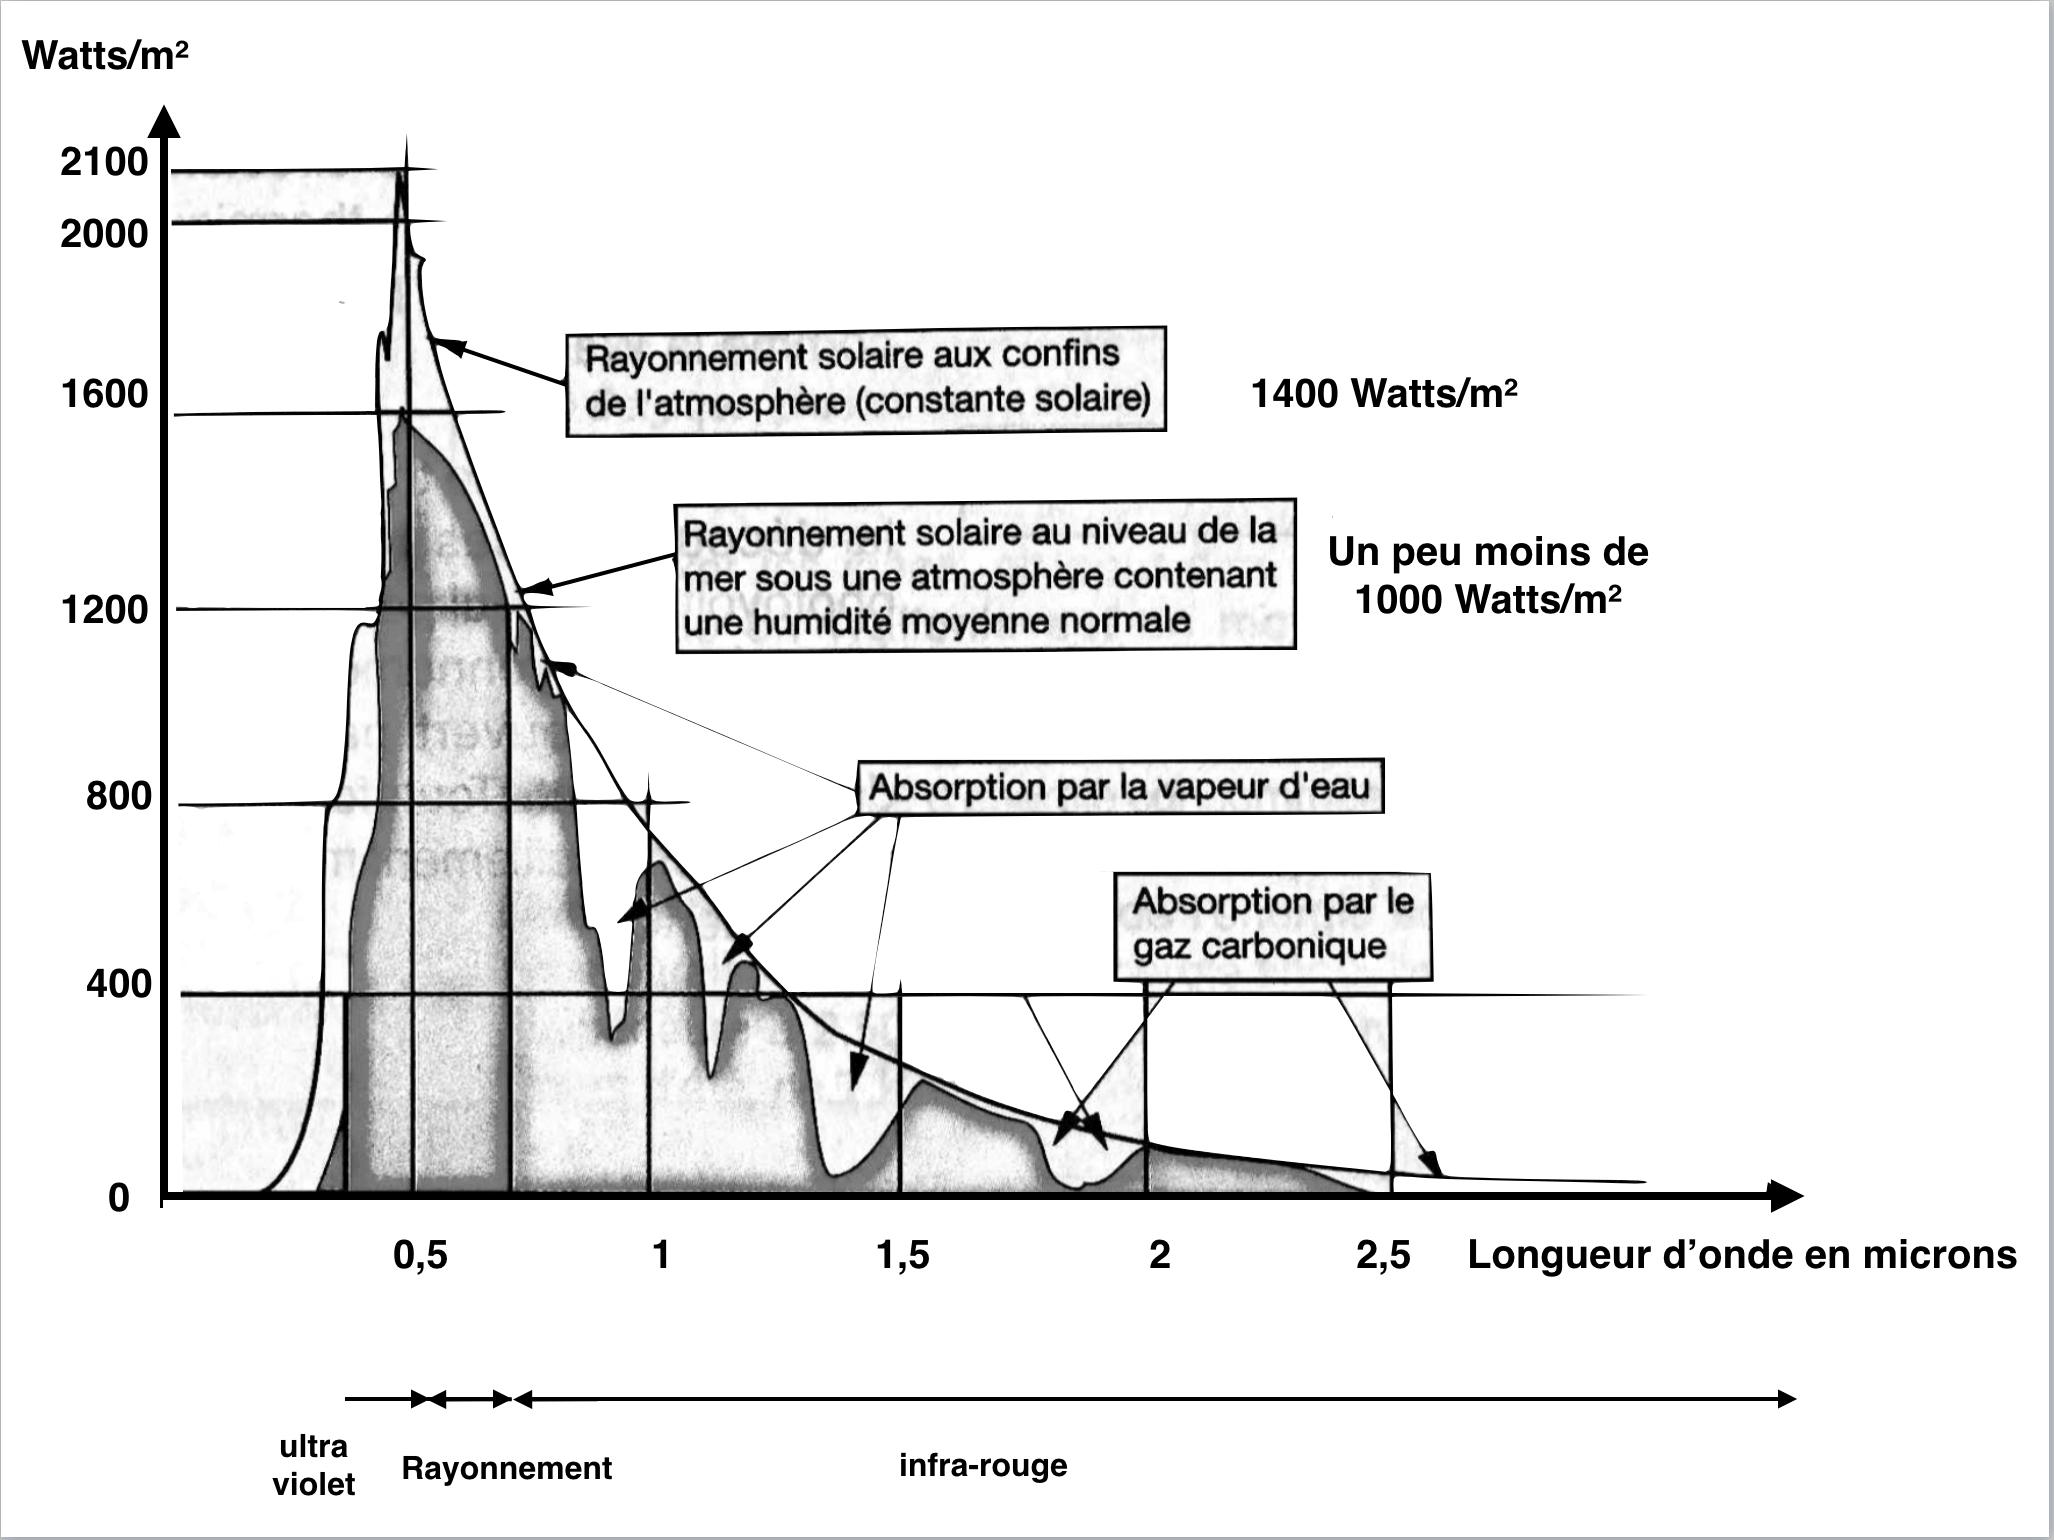 graphe-rayonnement-solaire